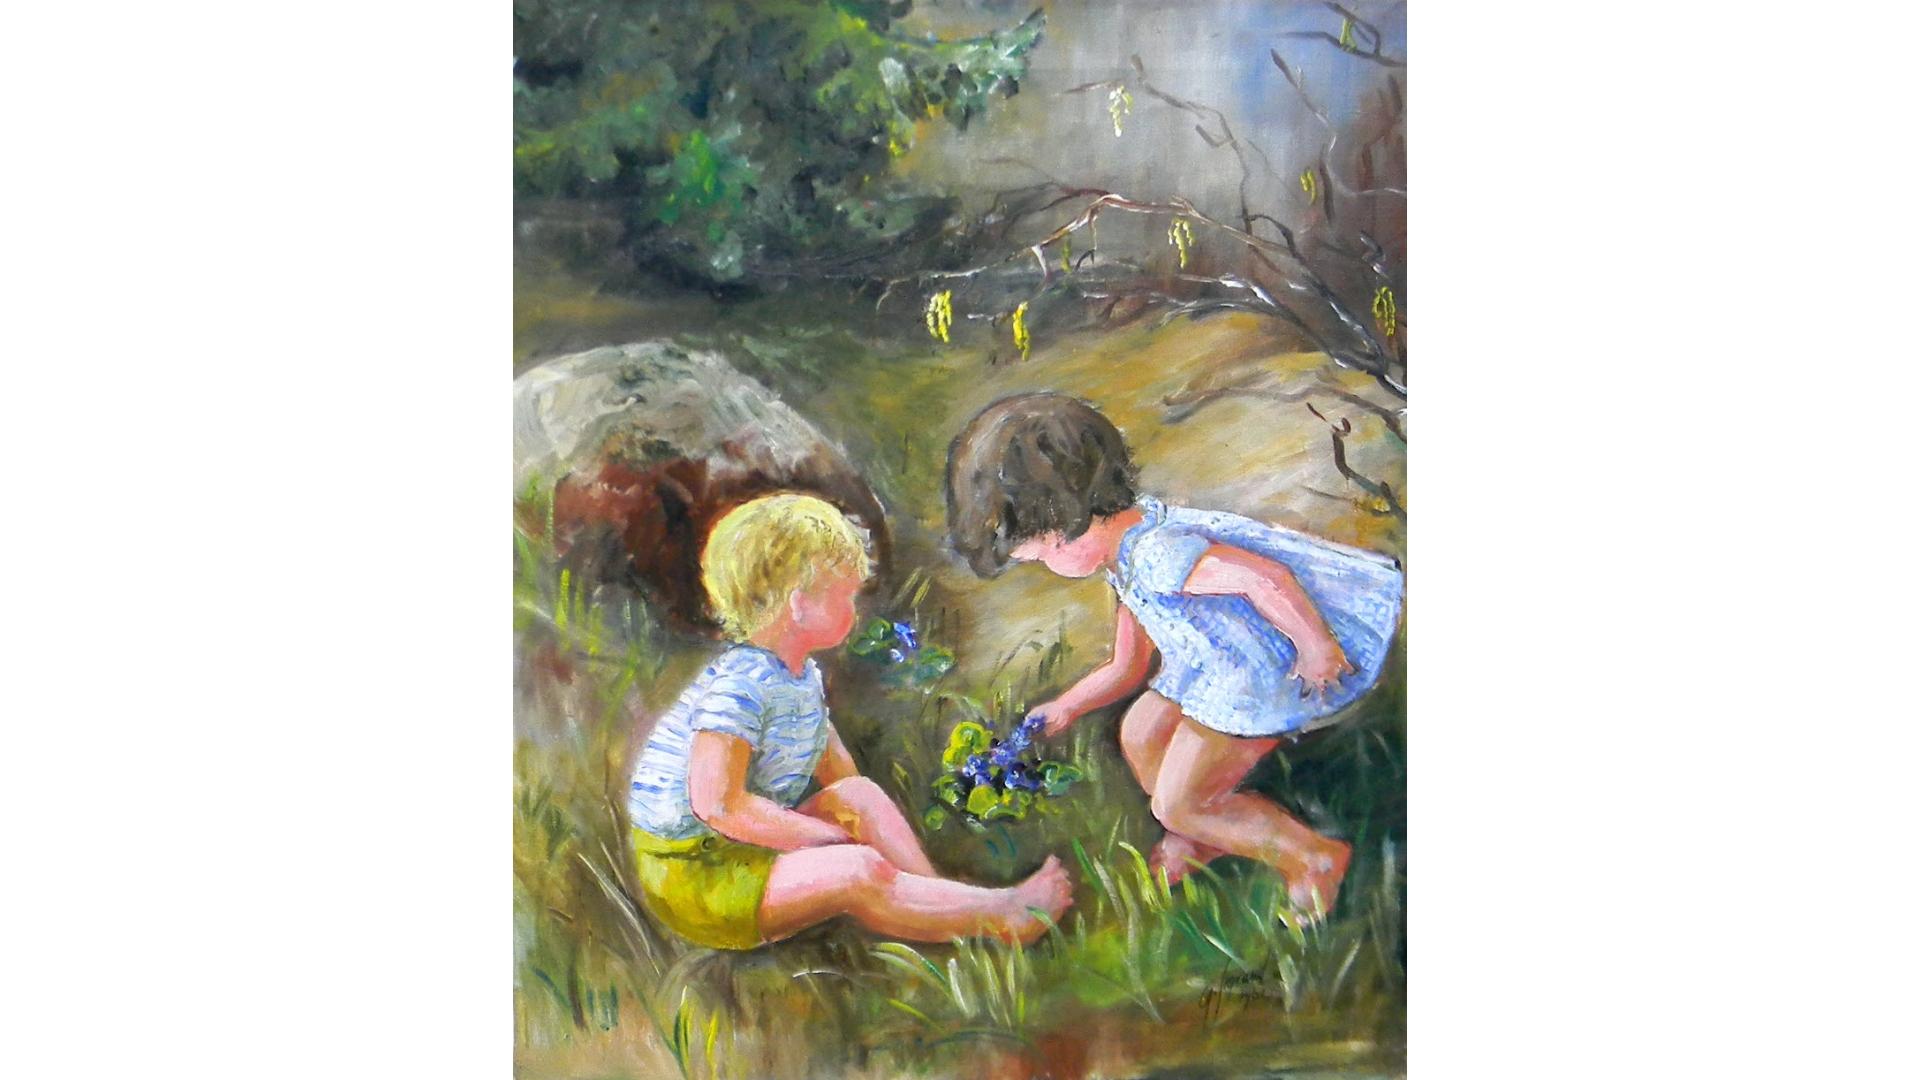 Õlimaal Lapsed metsas G  Sigraud 1961, AM1390